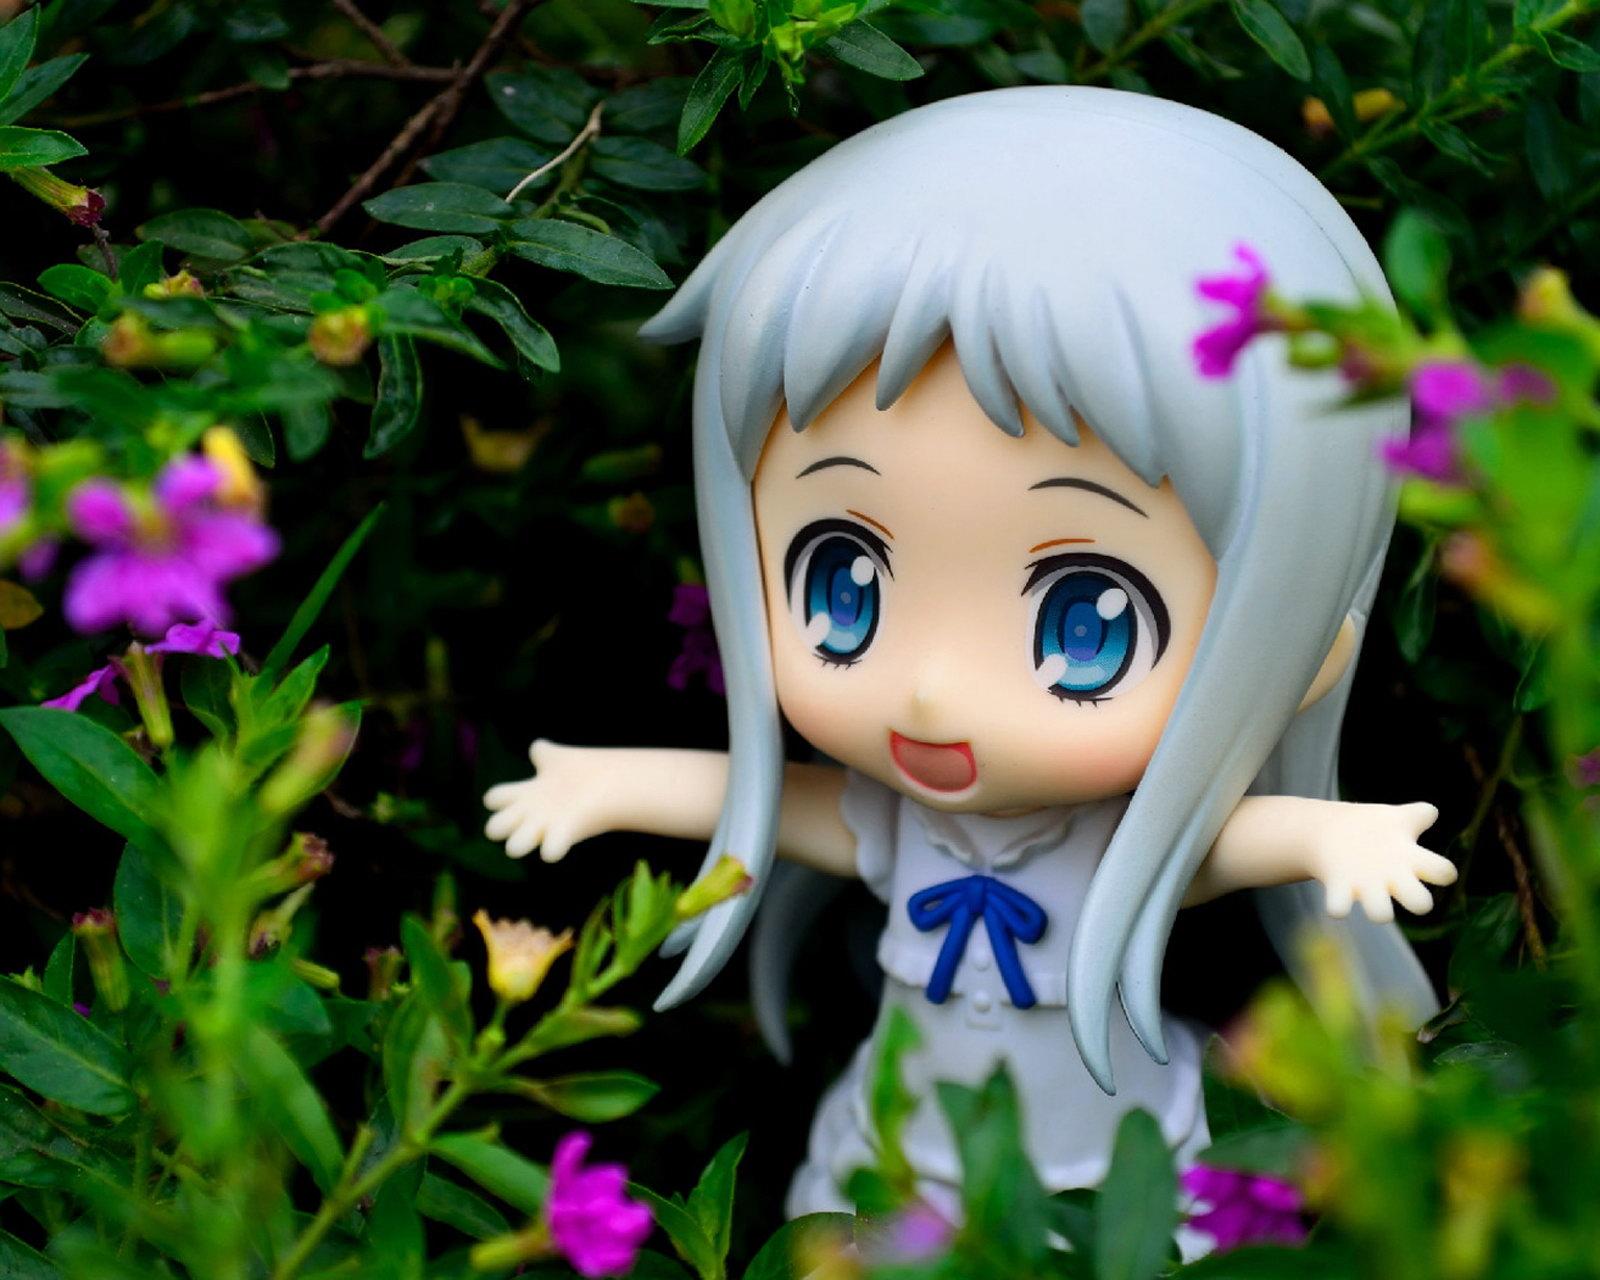 Android Hatsune Miku